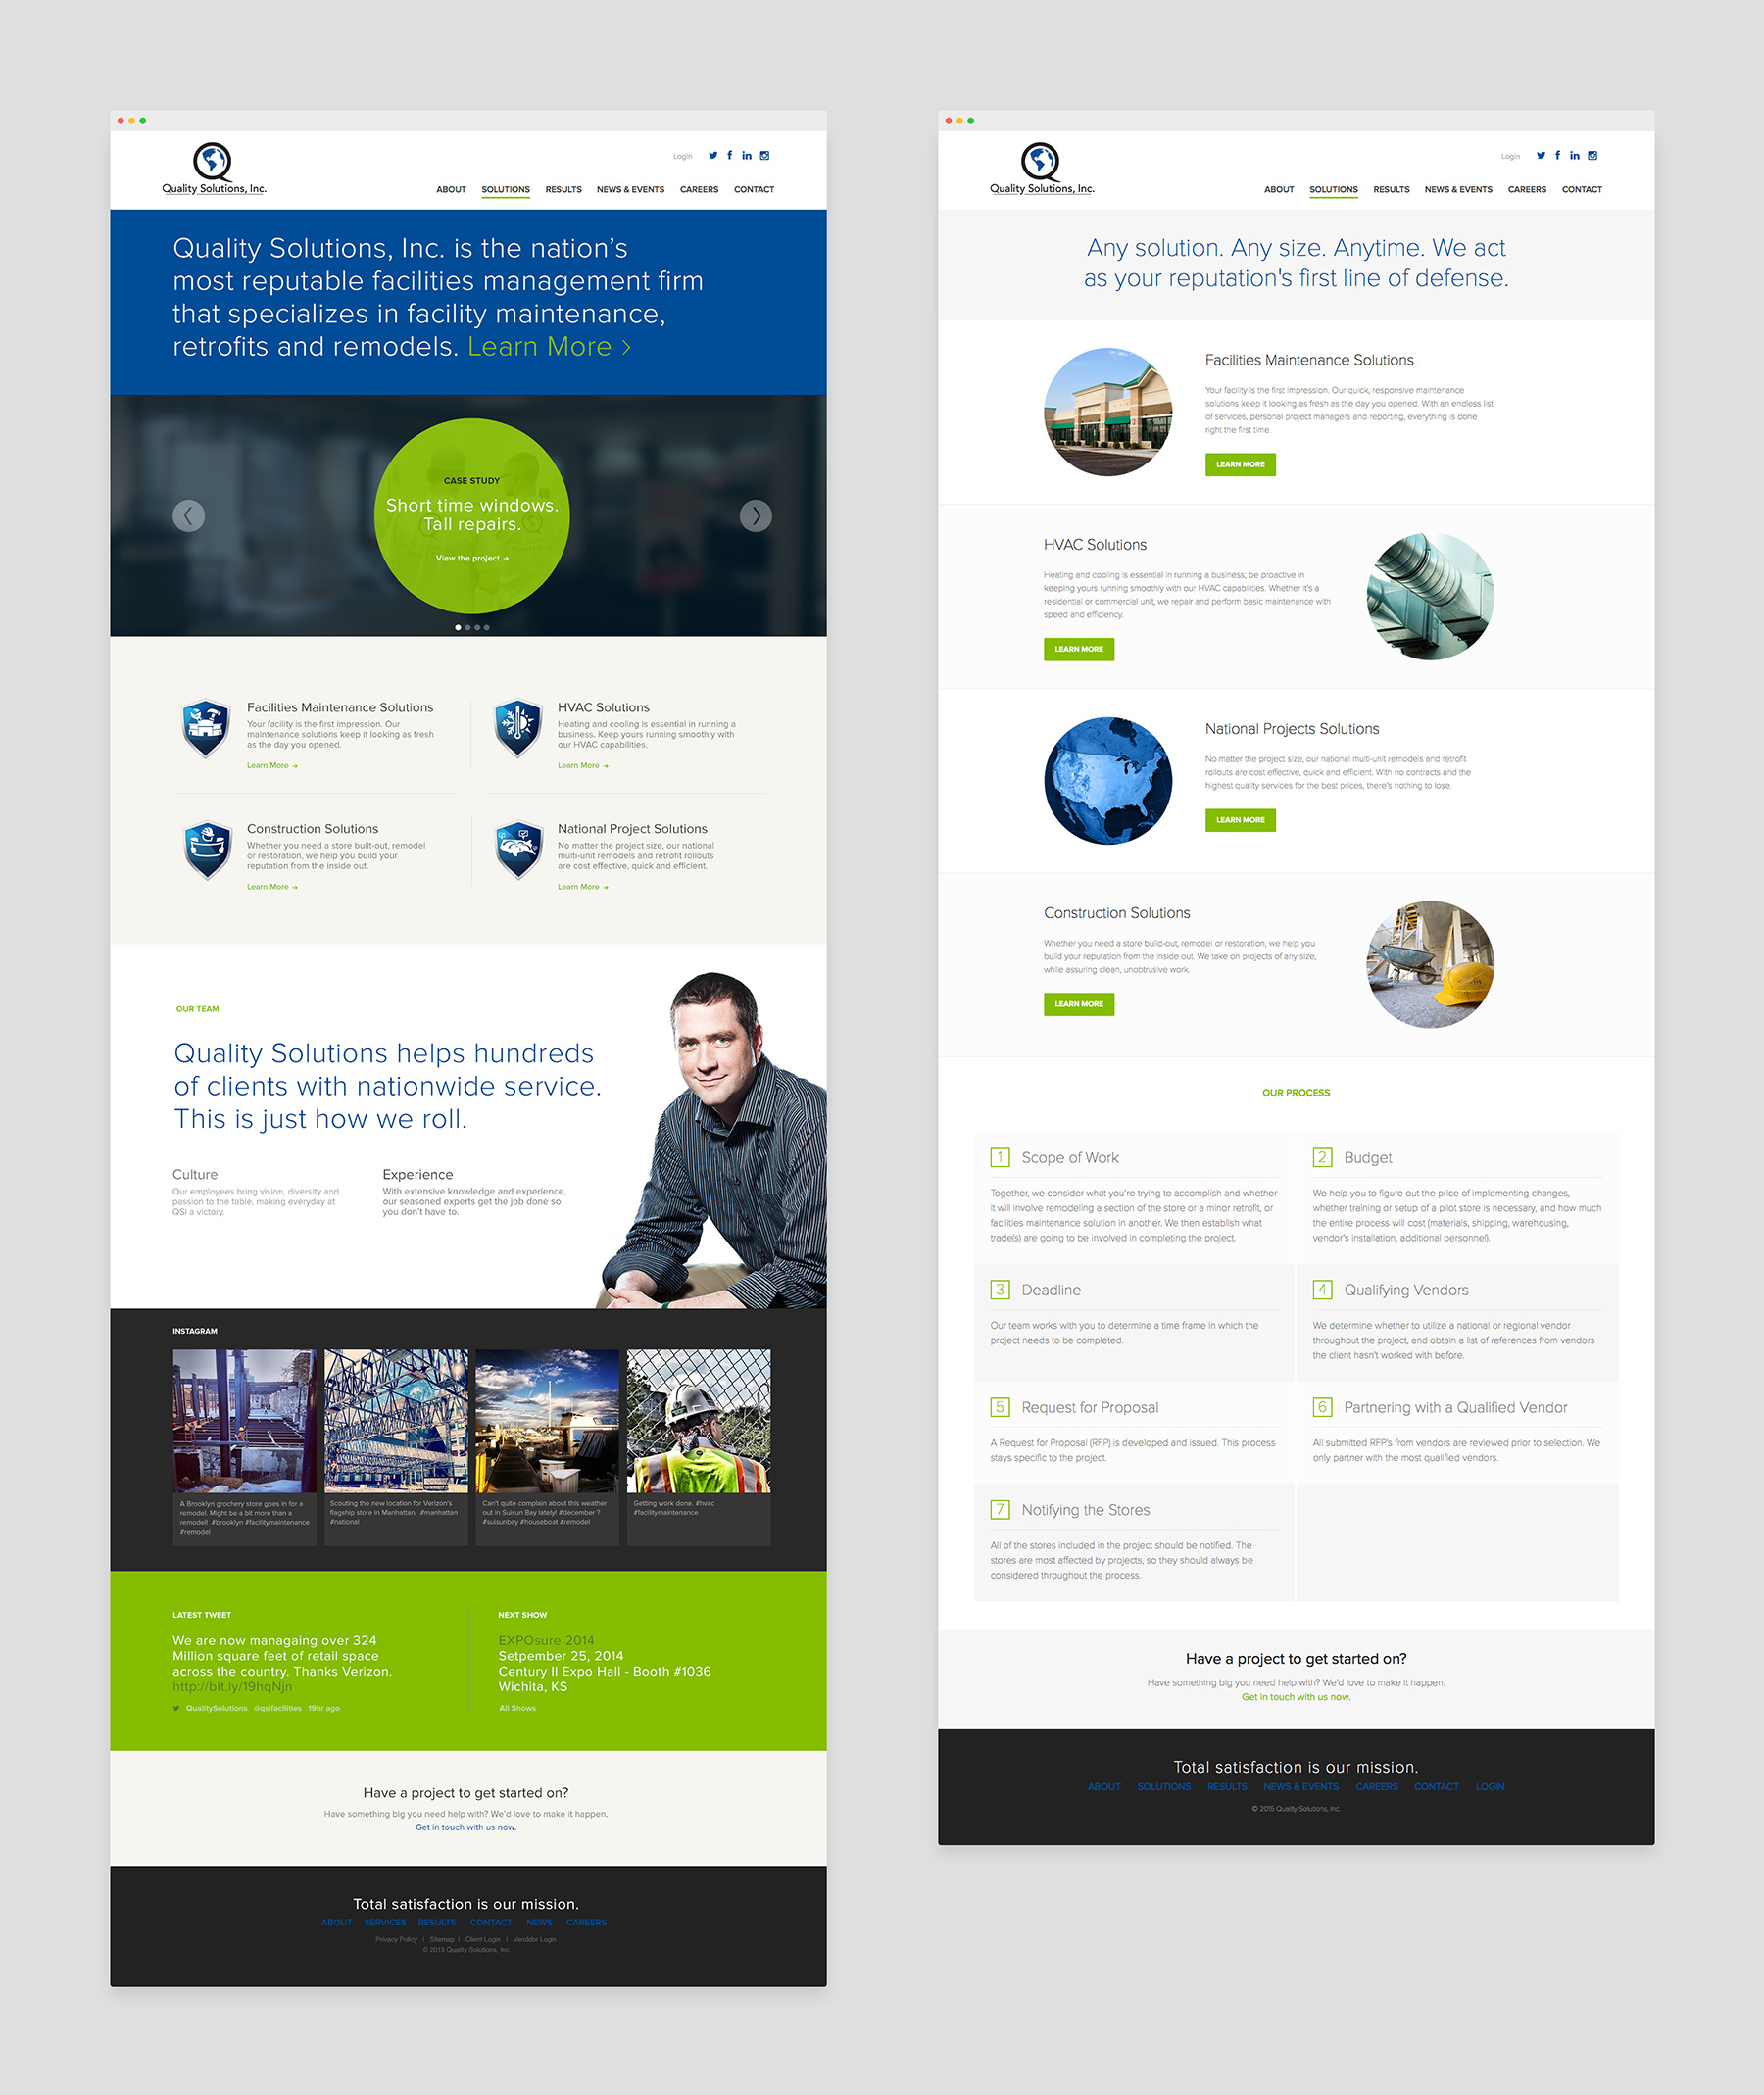 jajo-qsi-website-casestudy-2